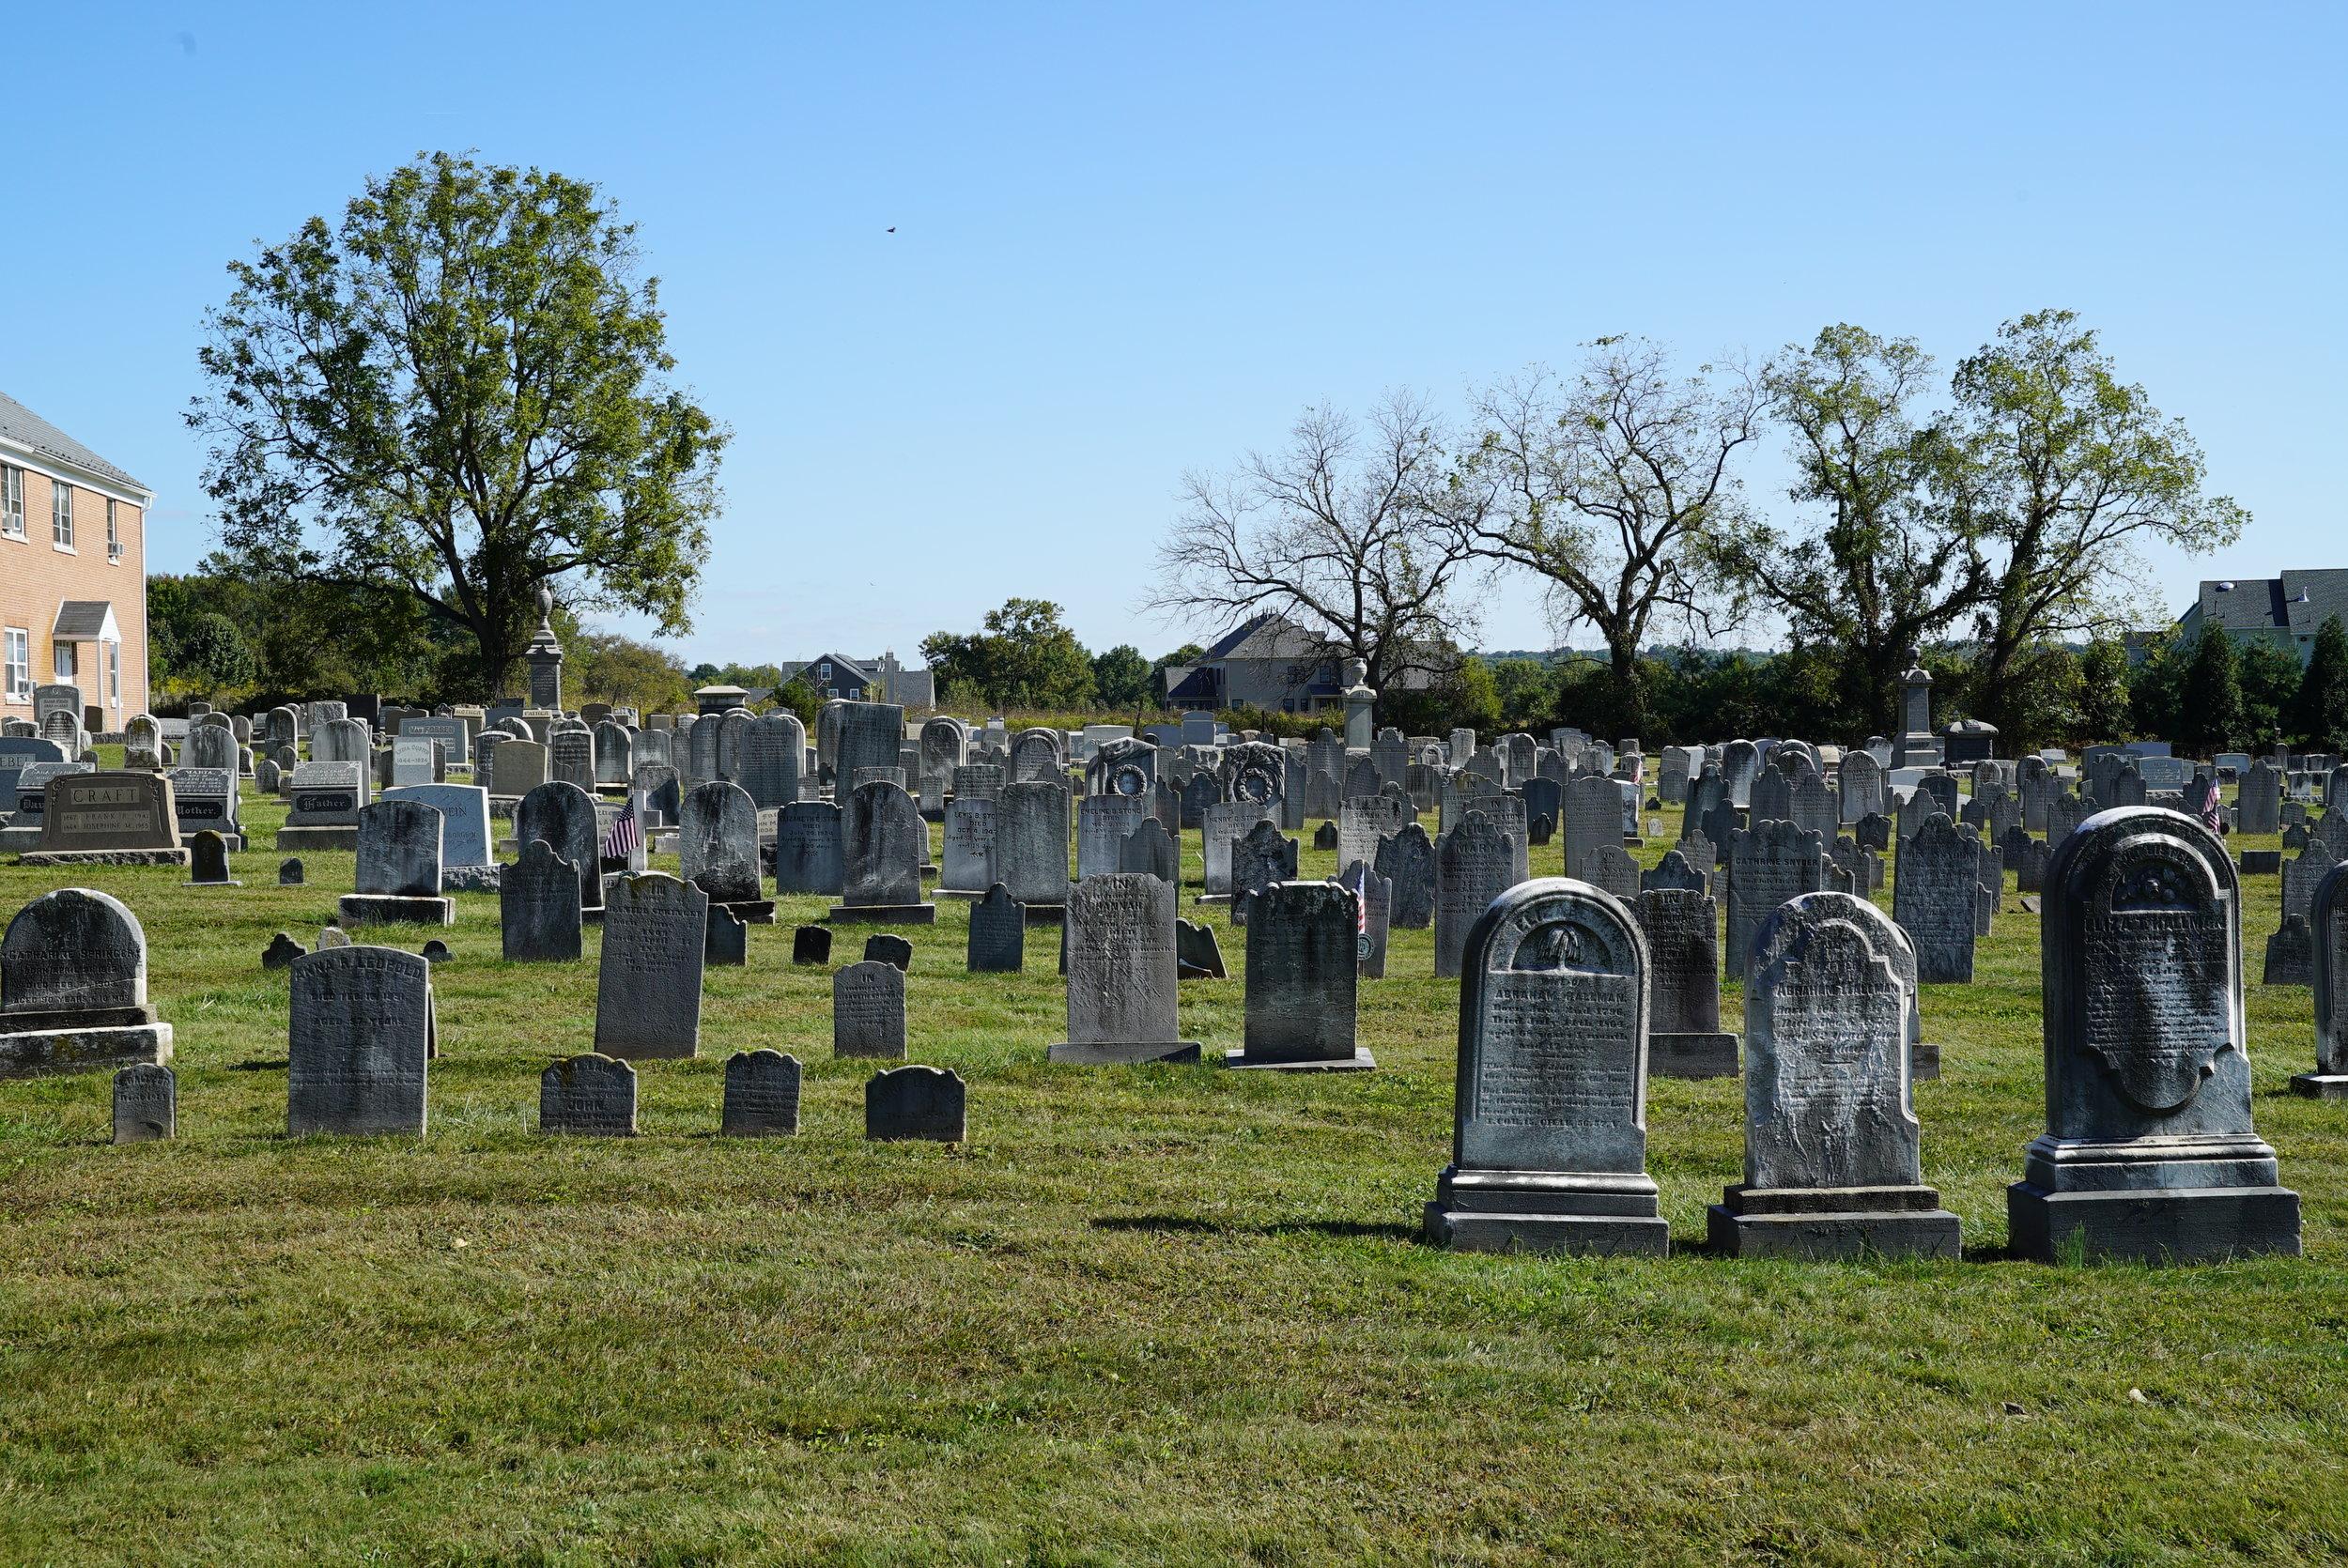 Wentz's United Church of Christ Cemetery. Worcster, Pennsylvania.